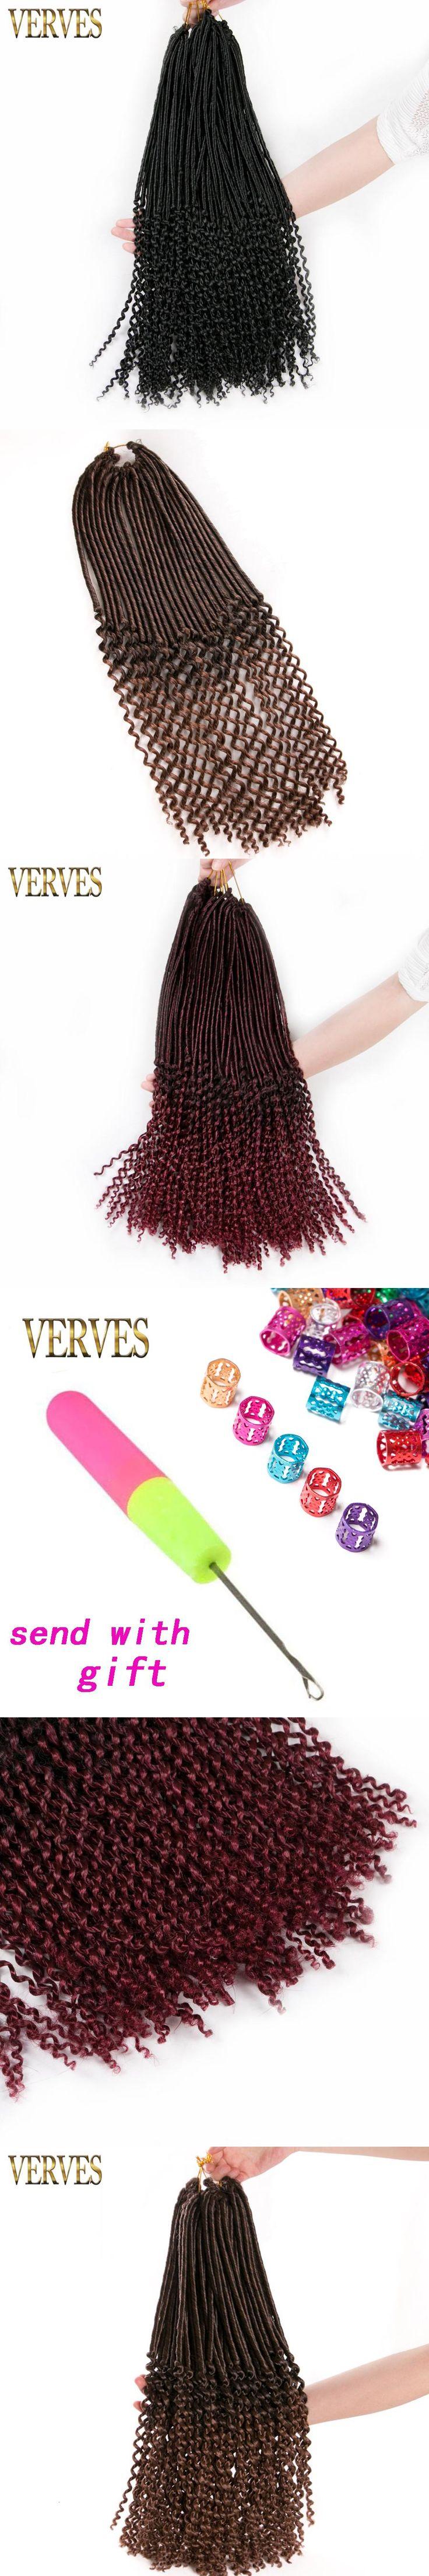 Crochet Braid hair extensions Faux Locs curly Hair 20 inch 24 strands/pack VERVES 1 pack Synthetic Fiber Braiding Hair